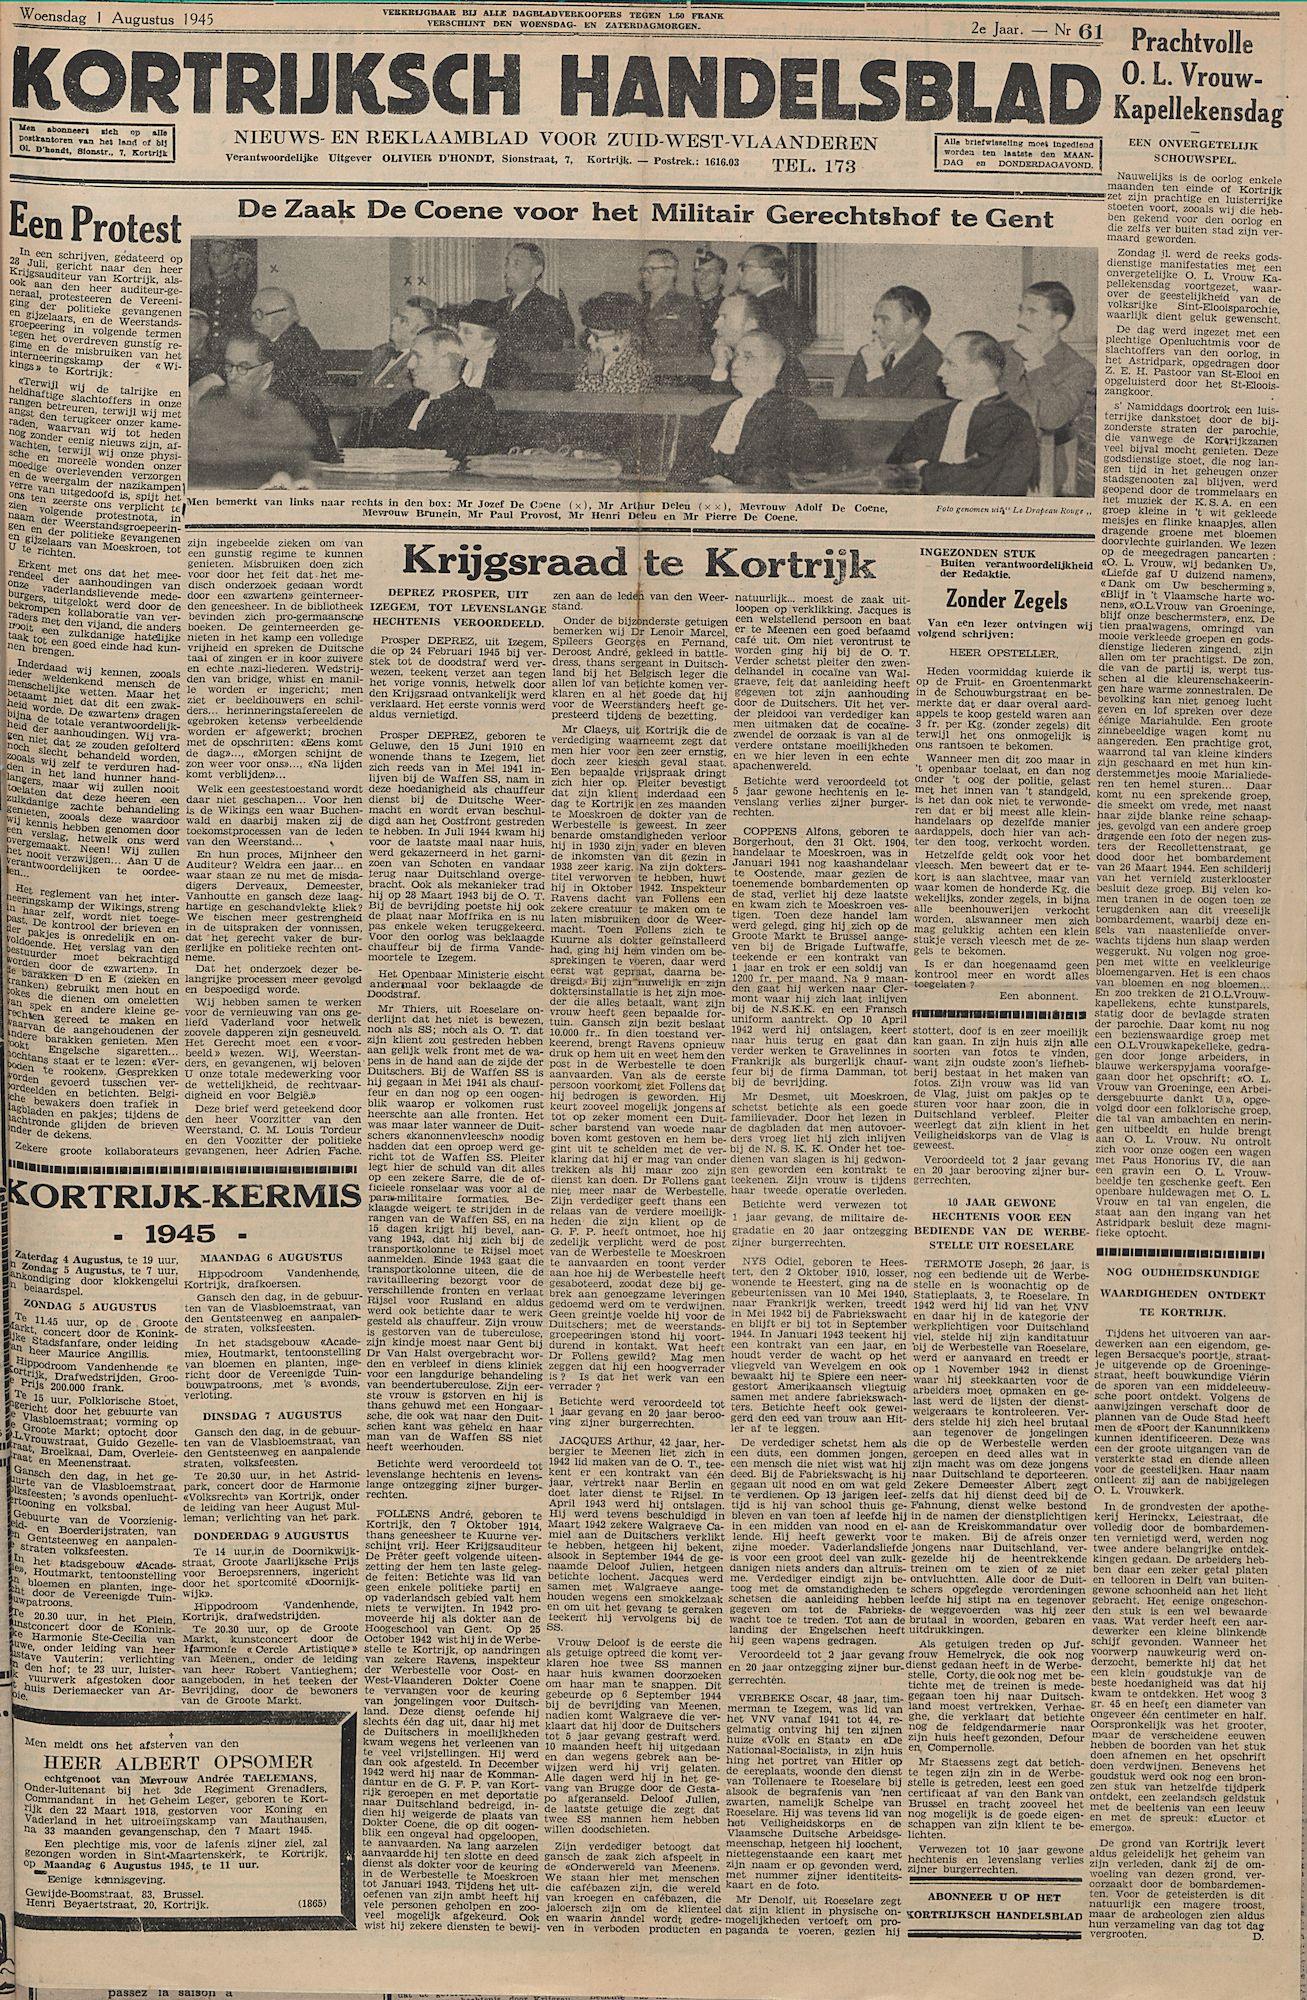 Kortrijksch Handelsblad 1 augustus 1945 Nr61 p1